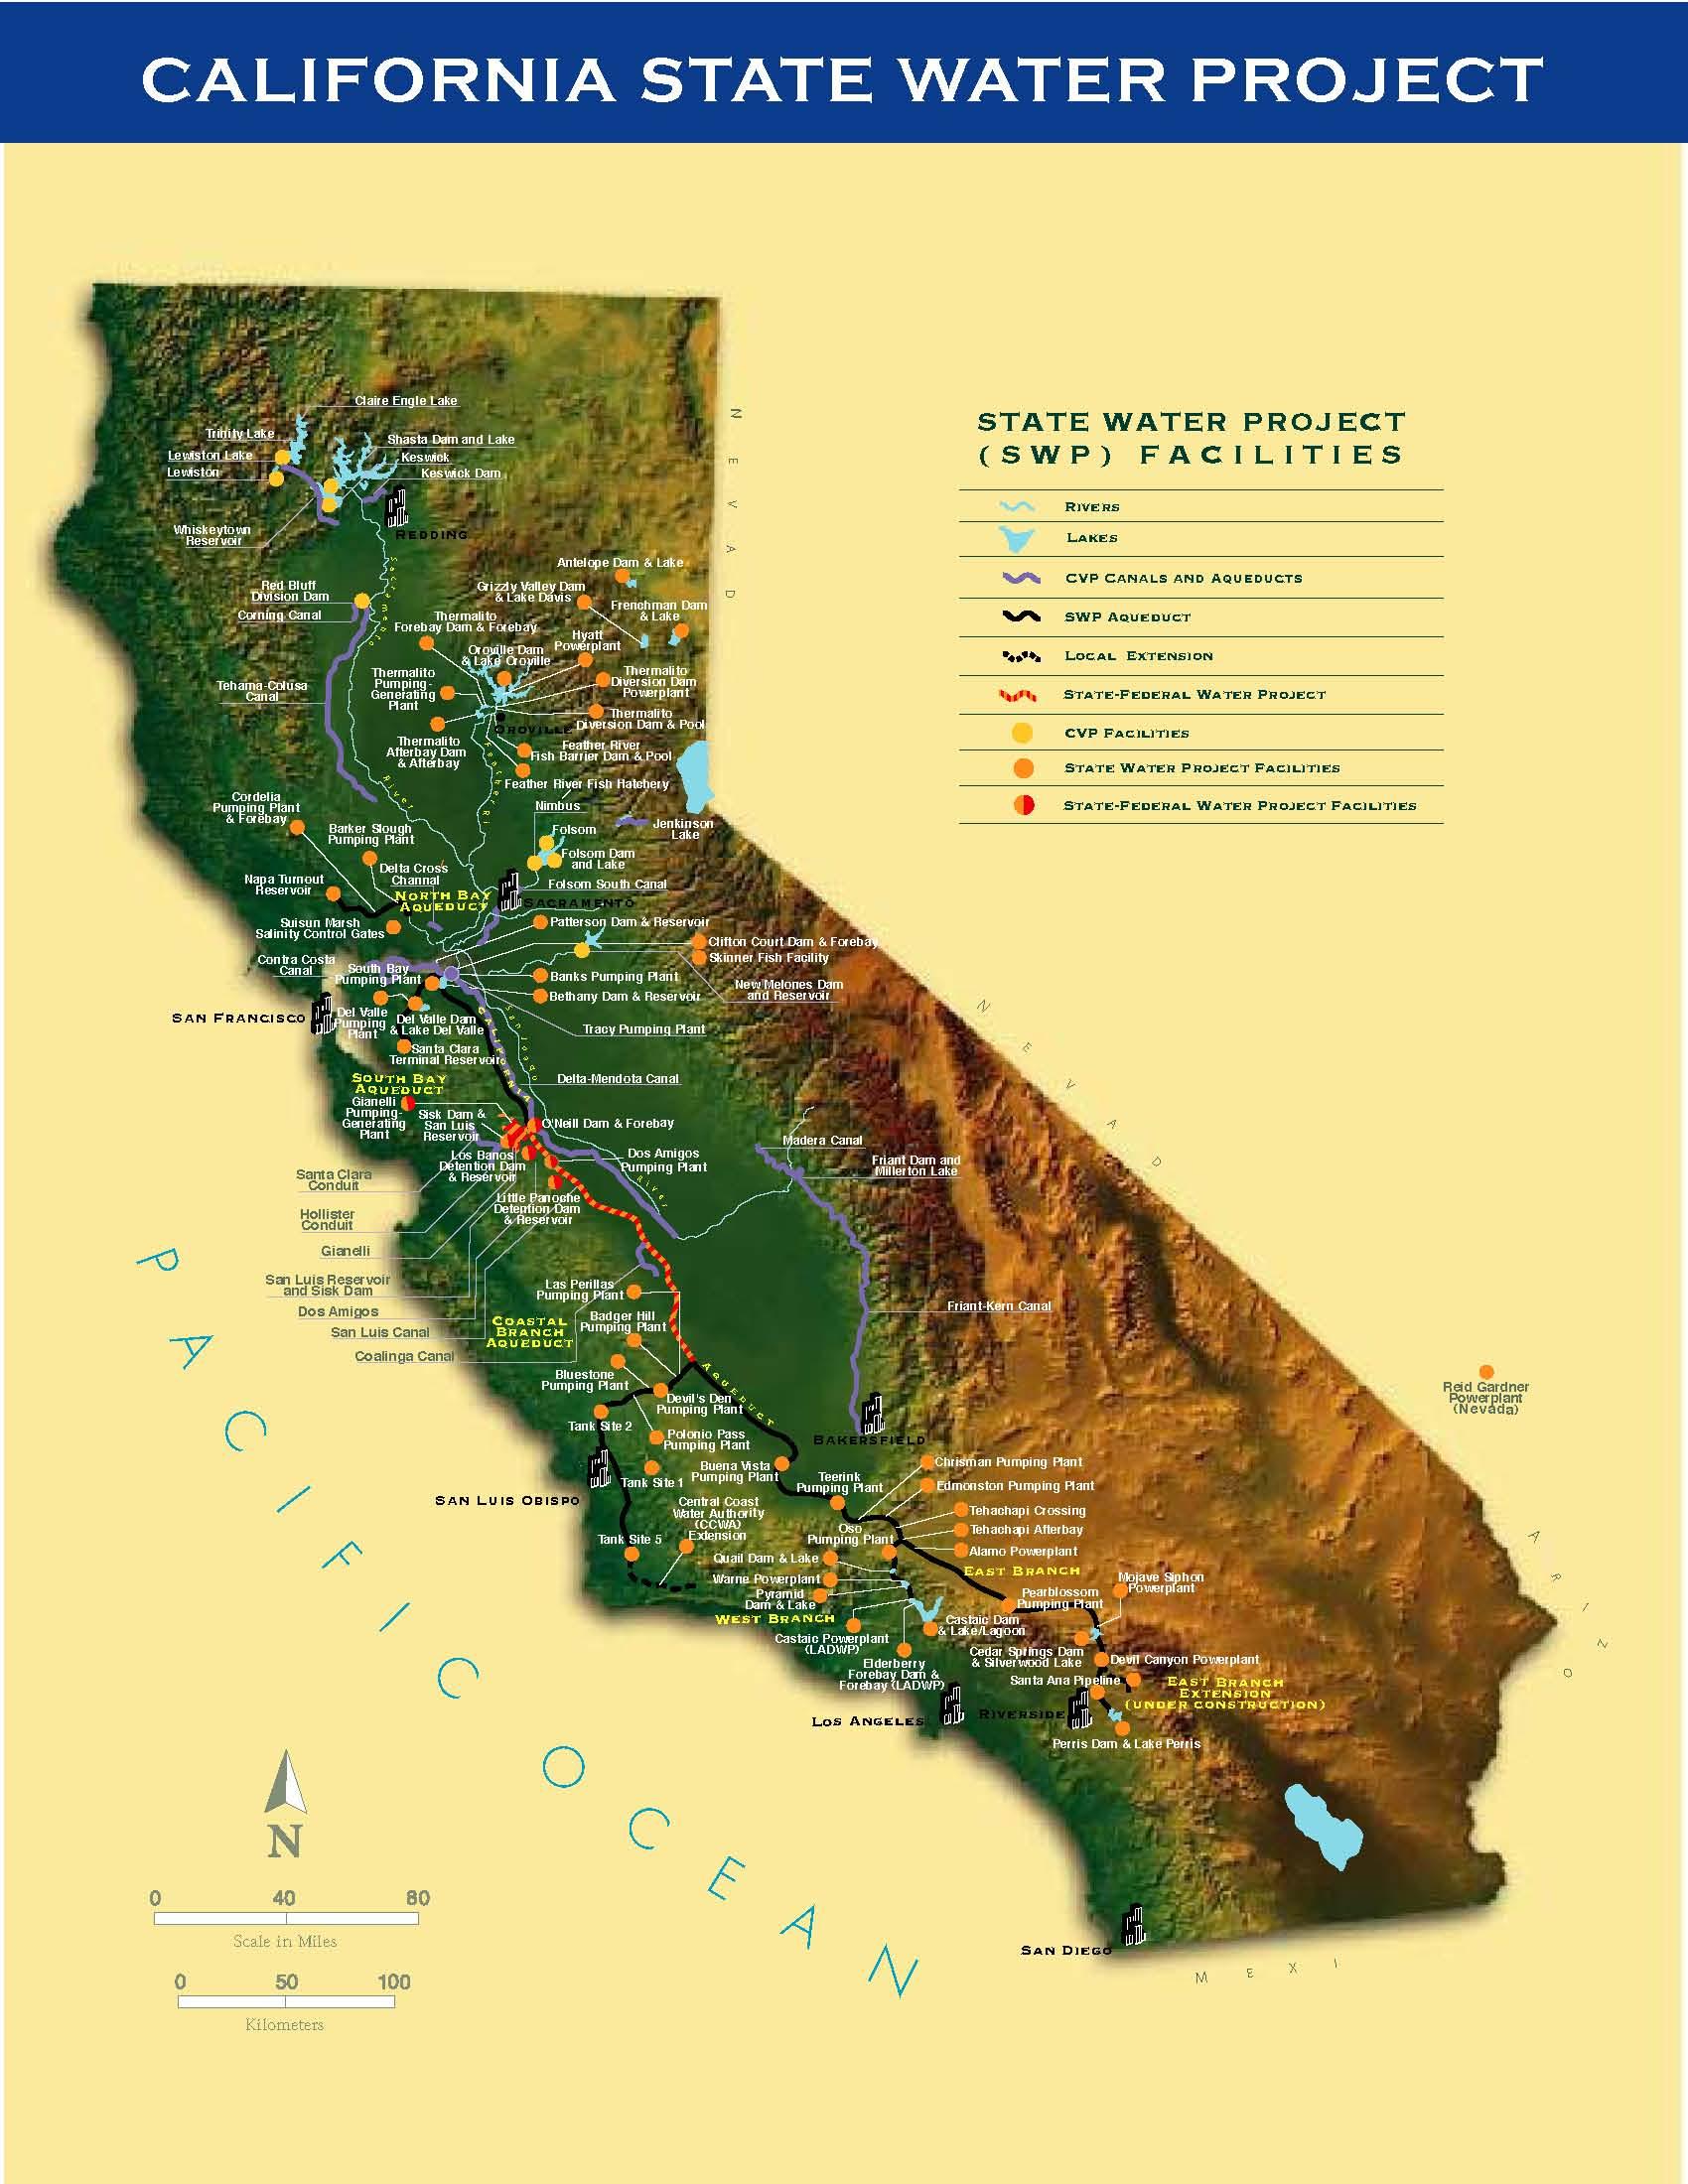 Sacramento San Joaquin Delta Reference Maps - Map Of California Delta Waterways